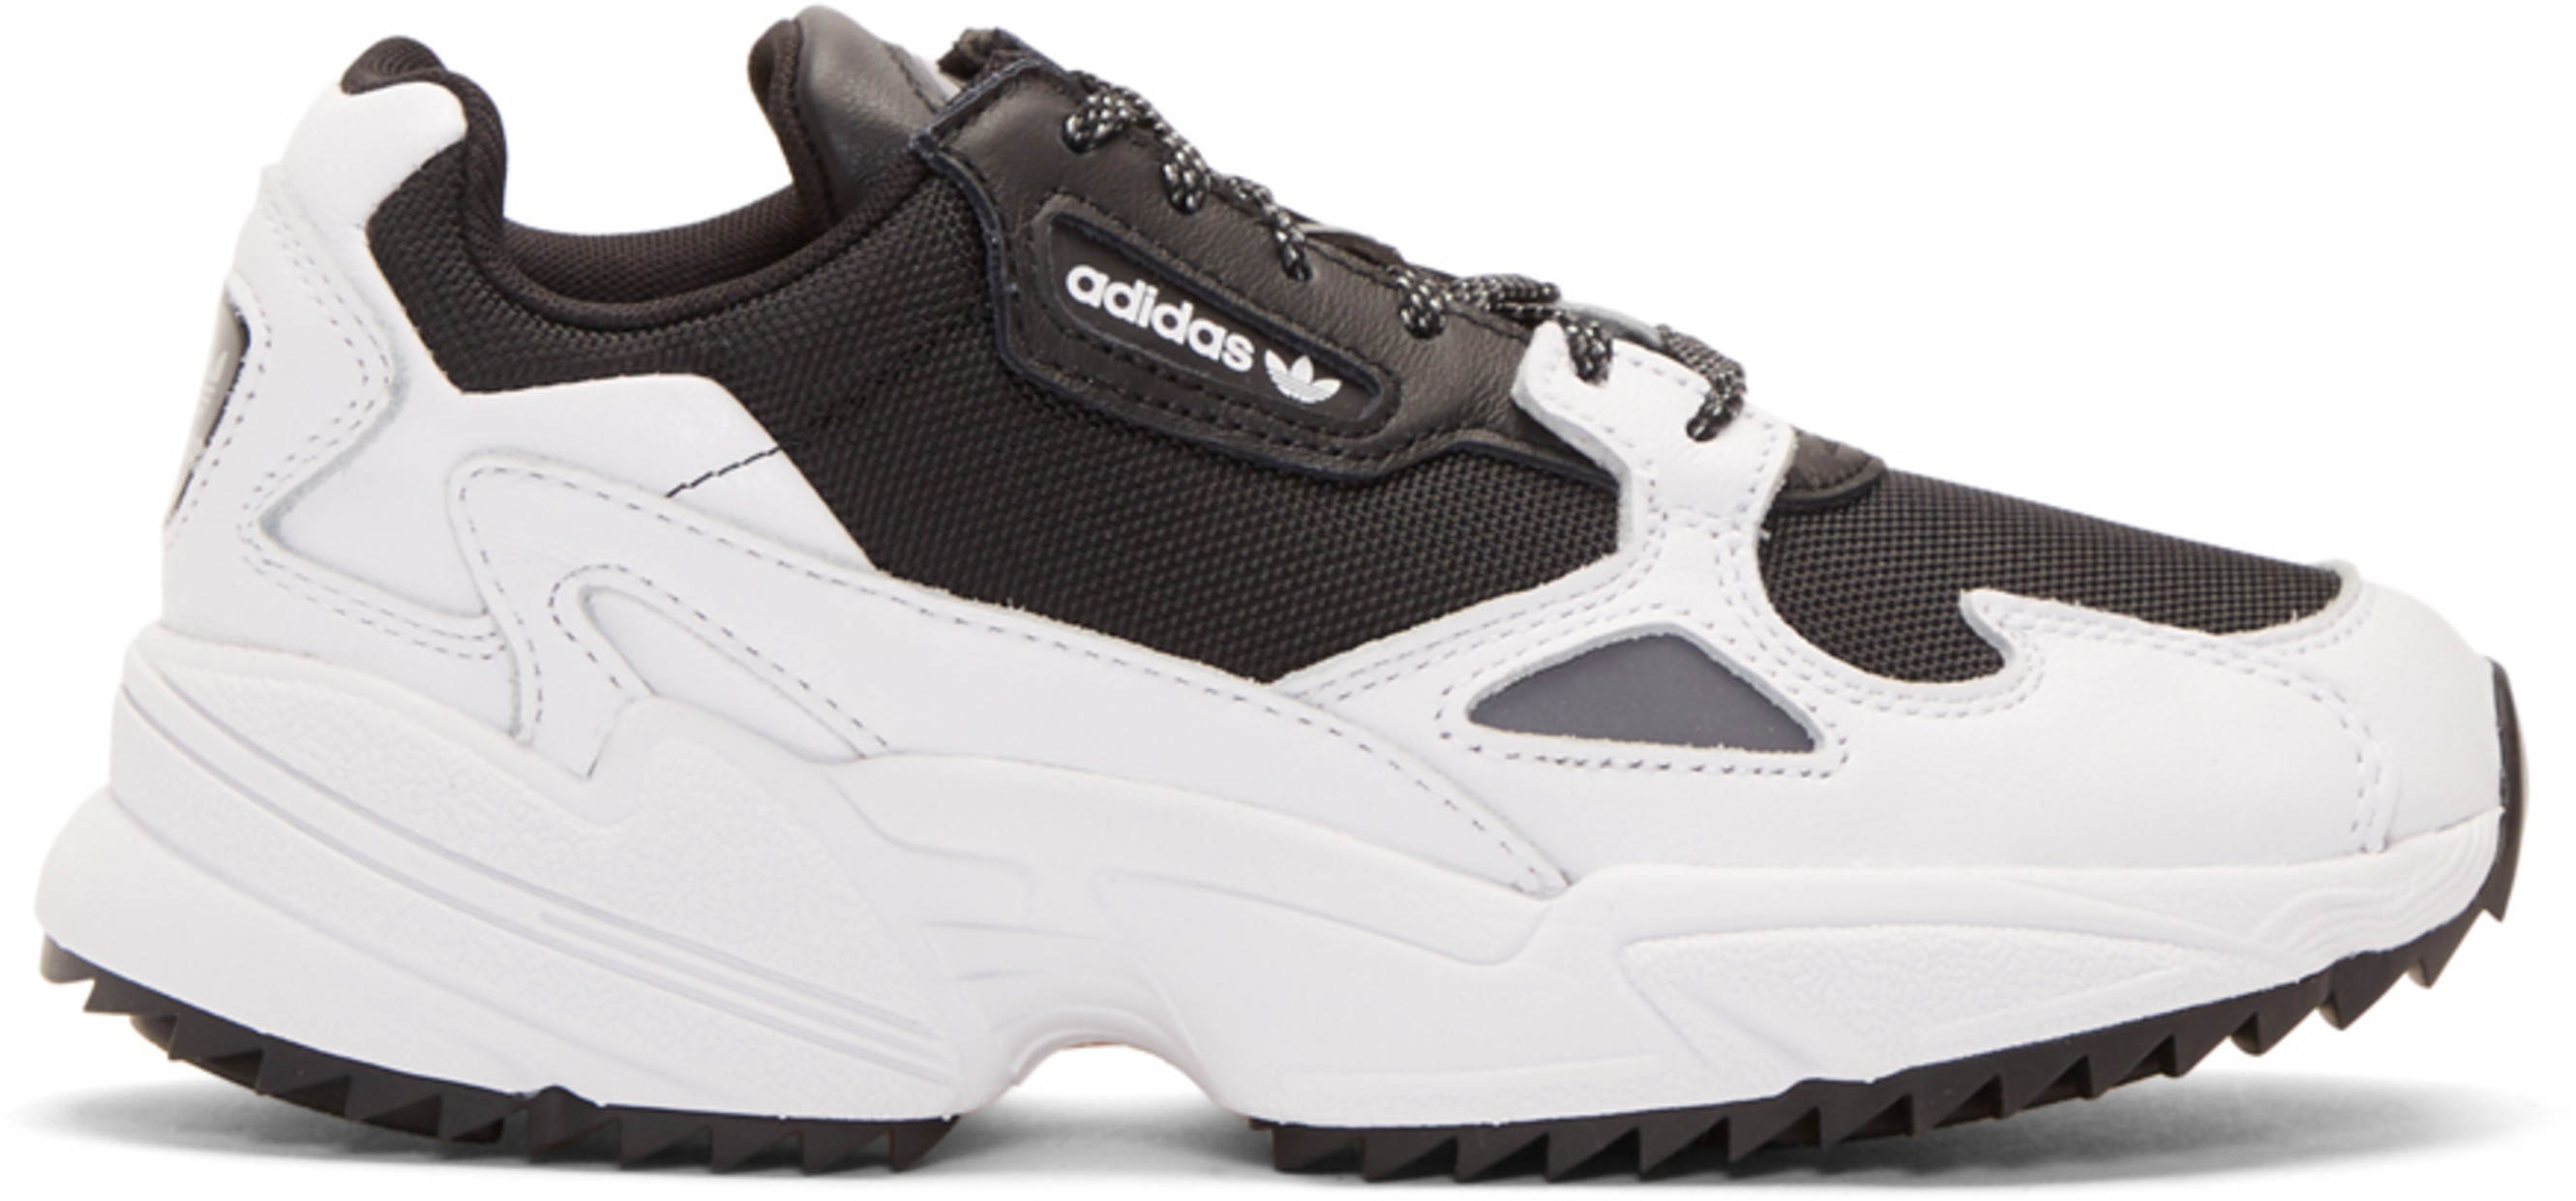 Black & White Falcon Trail Sneakers